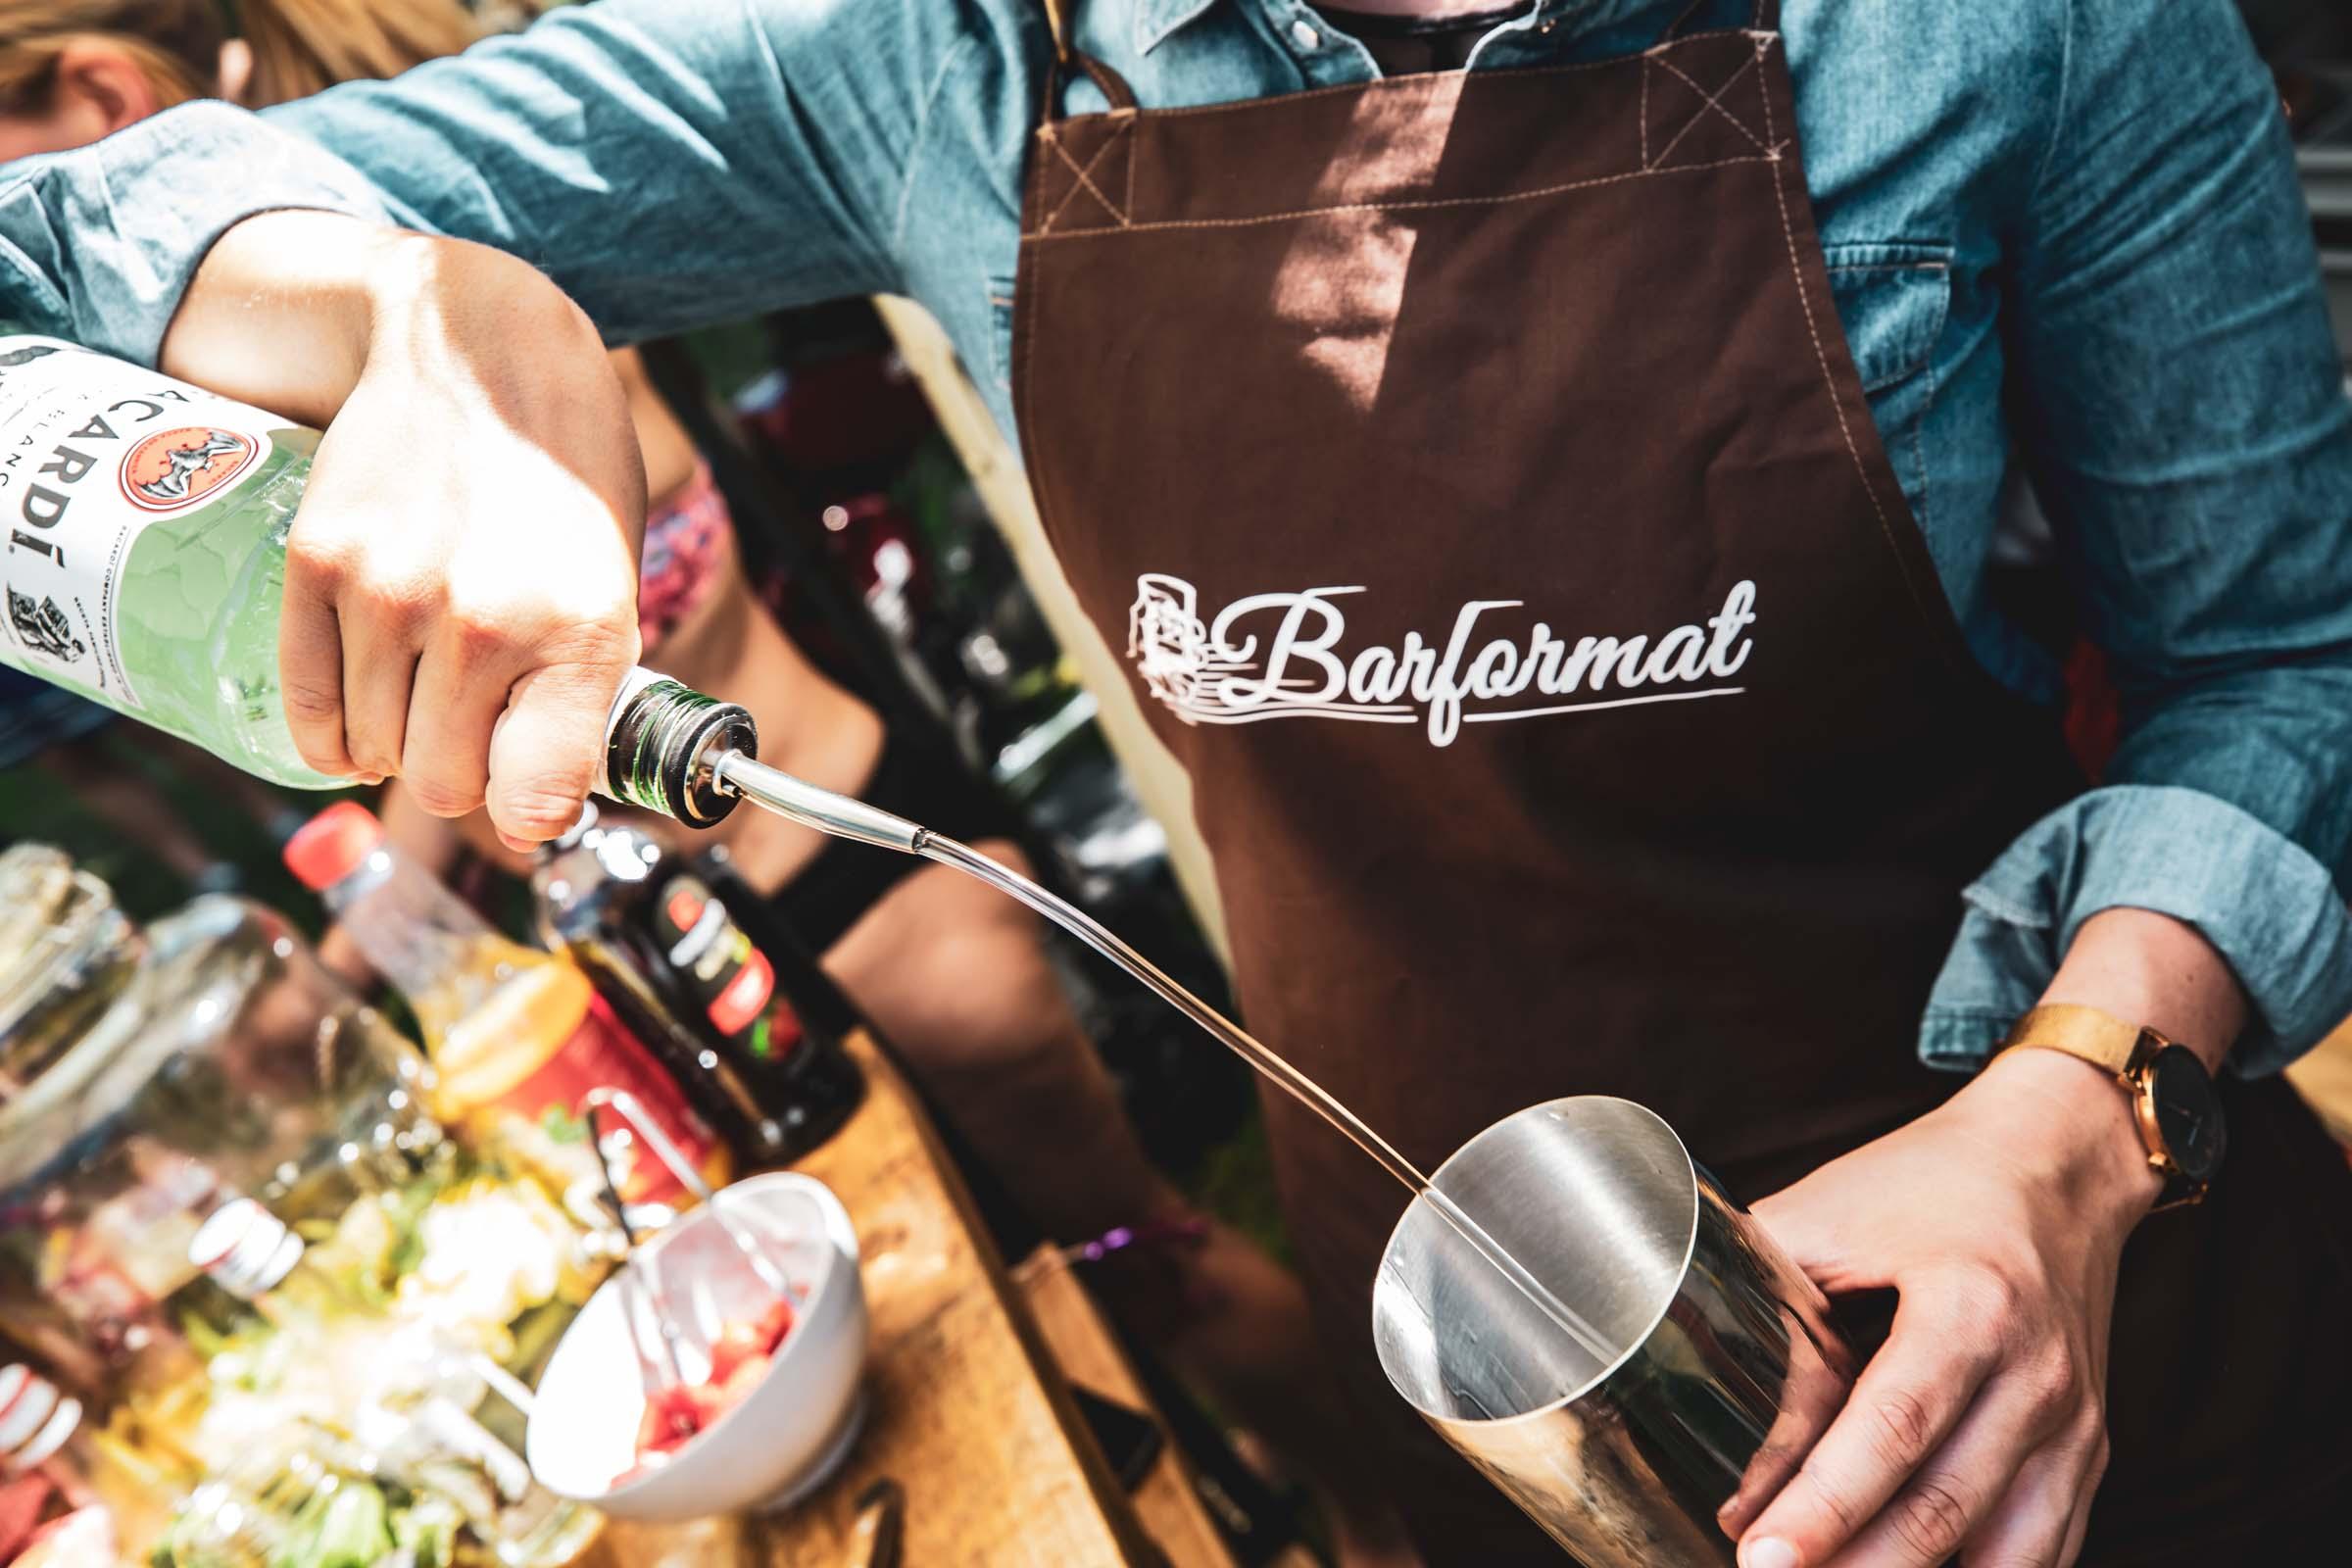 Mobile |Bar | Hannover | Cocktailservice | Foodtruck | Getränke | Catering | Cocktails | Wein | Aperitif | Solero | Gin | Barkeeper | Hochzeit | Messe | Firmenfeier |Buchen | Mieten |Anfragen